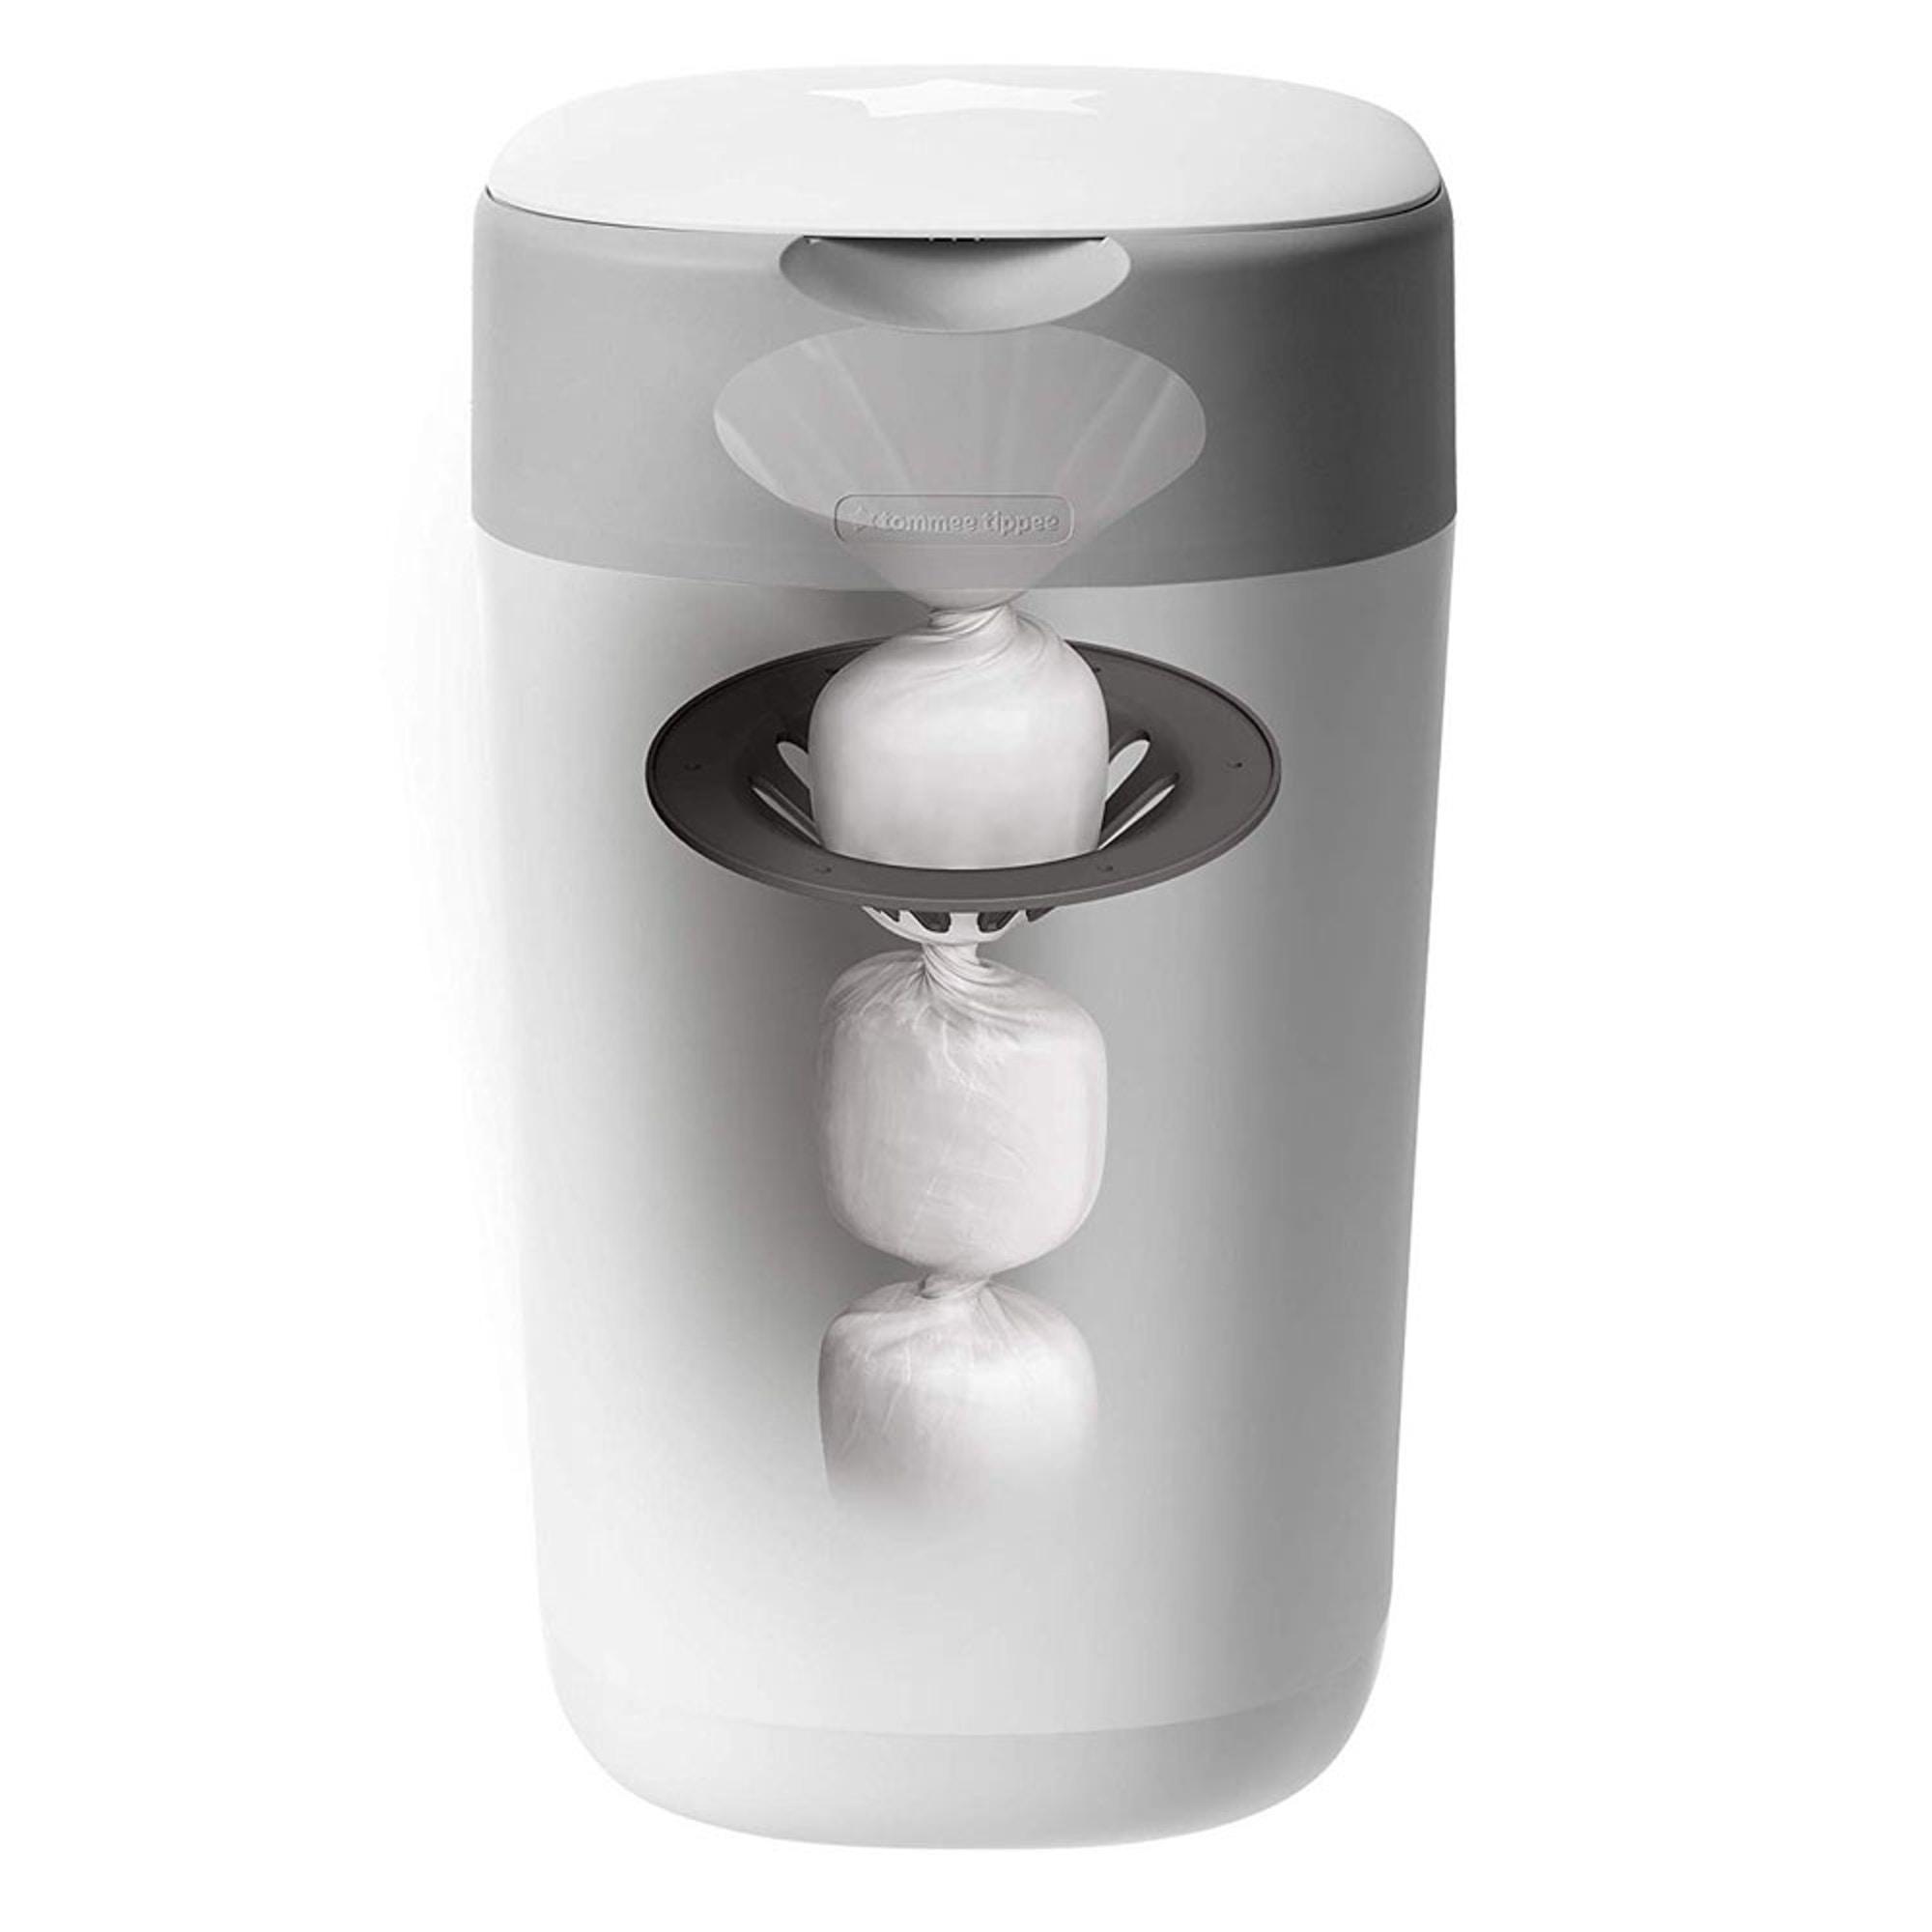 tommee-tippee-twist-click-nappy-disposal-bin-3